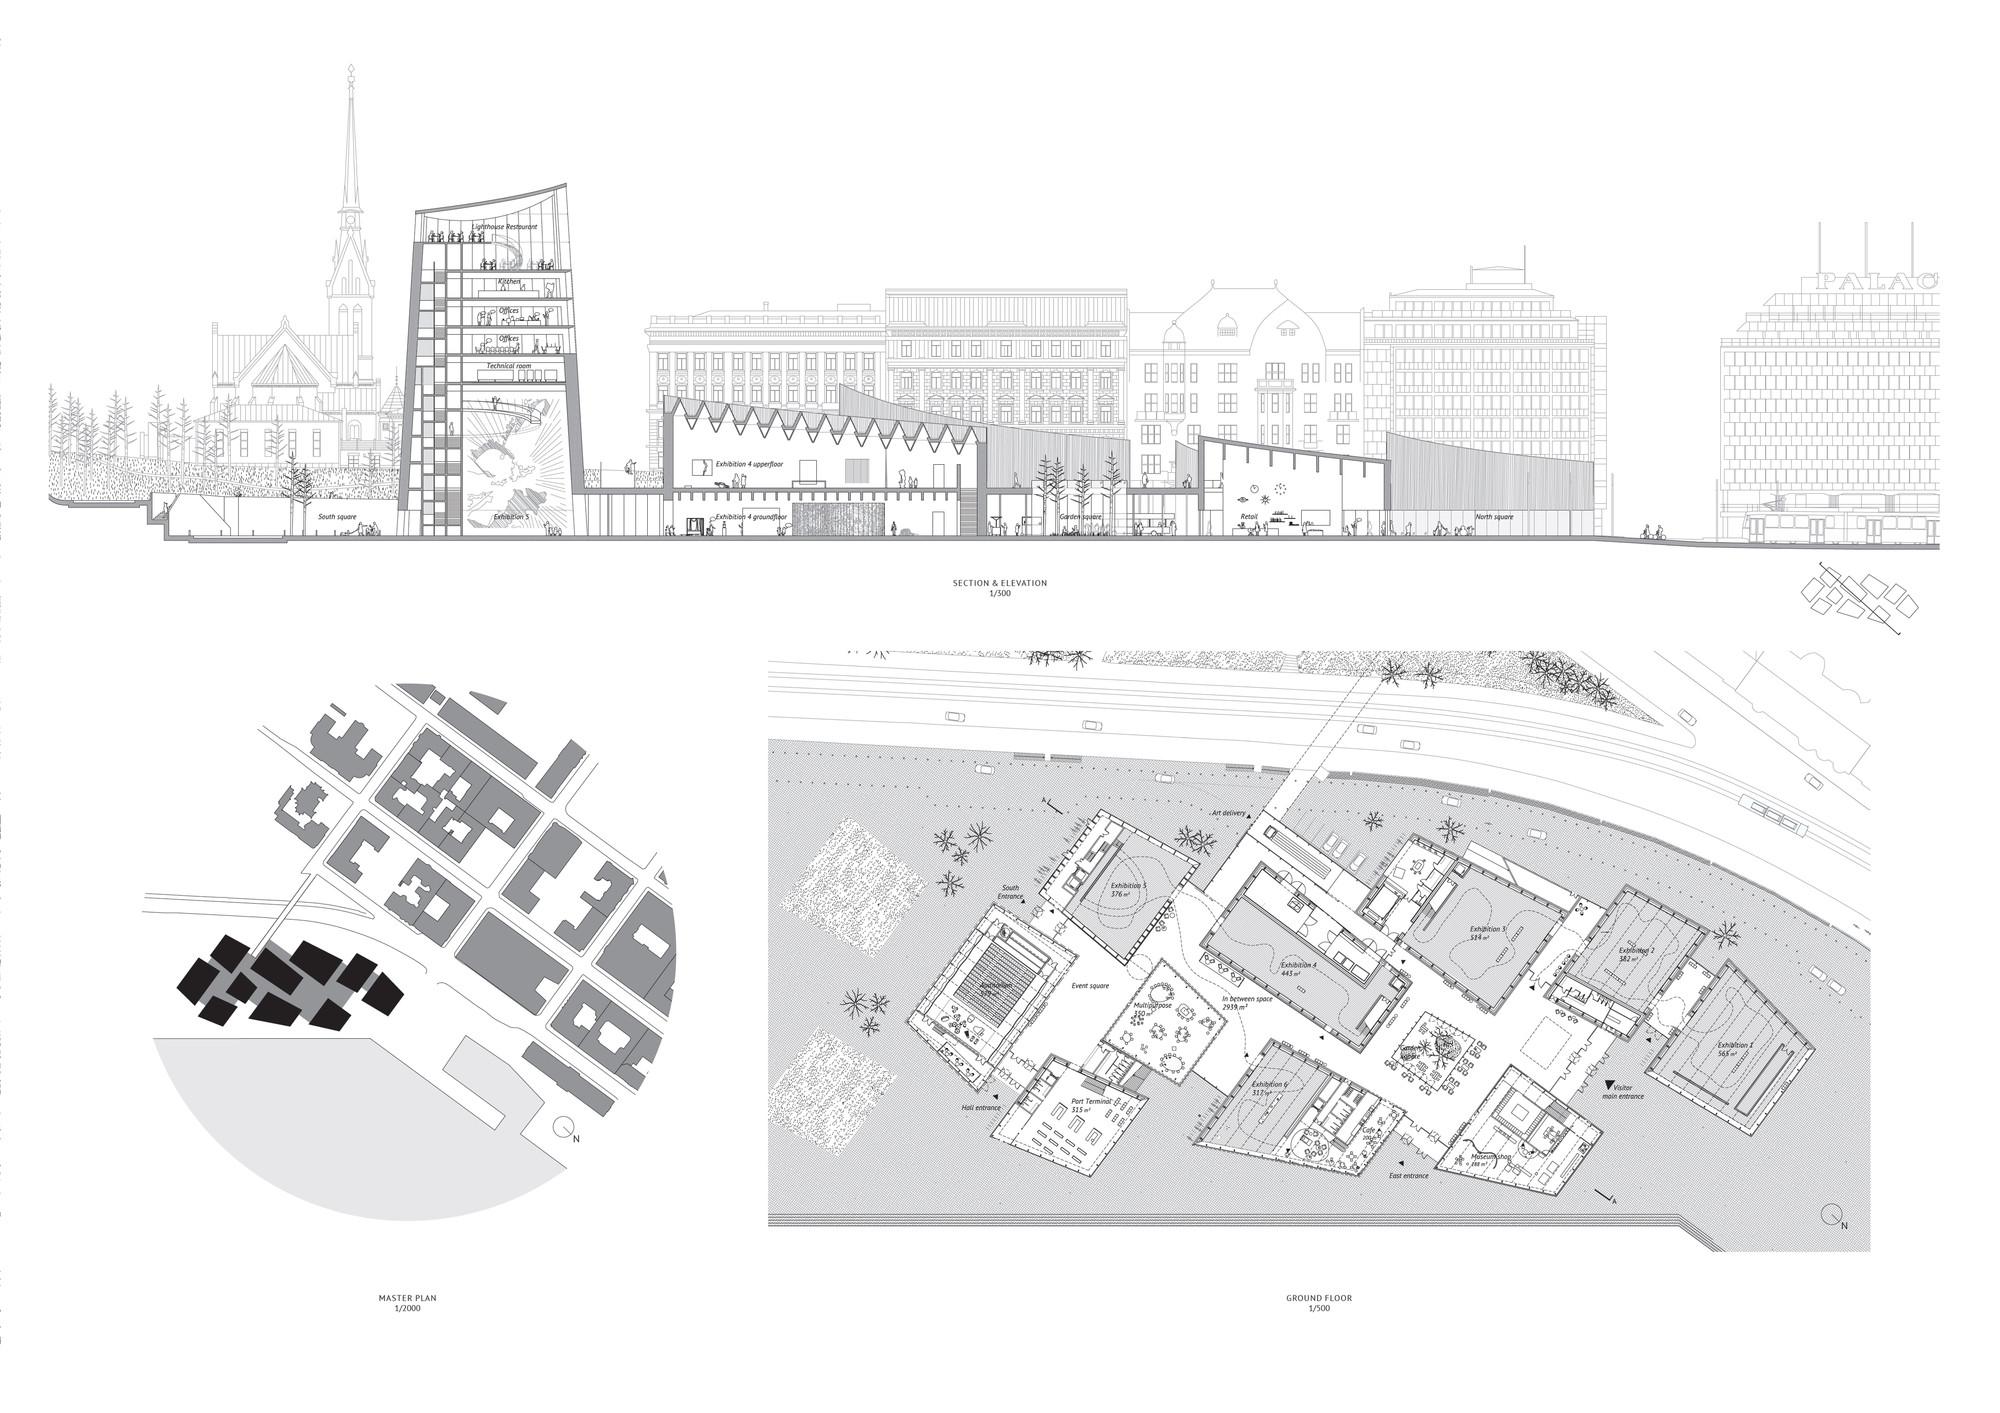 moreau kusunoki 39 s 39 art in the city 39 proposal wins